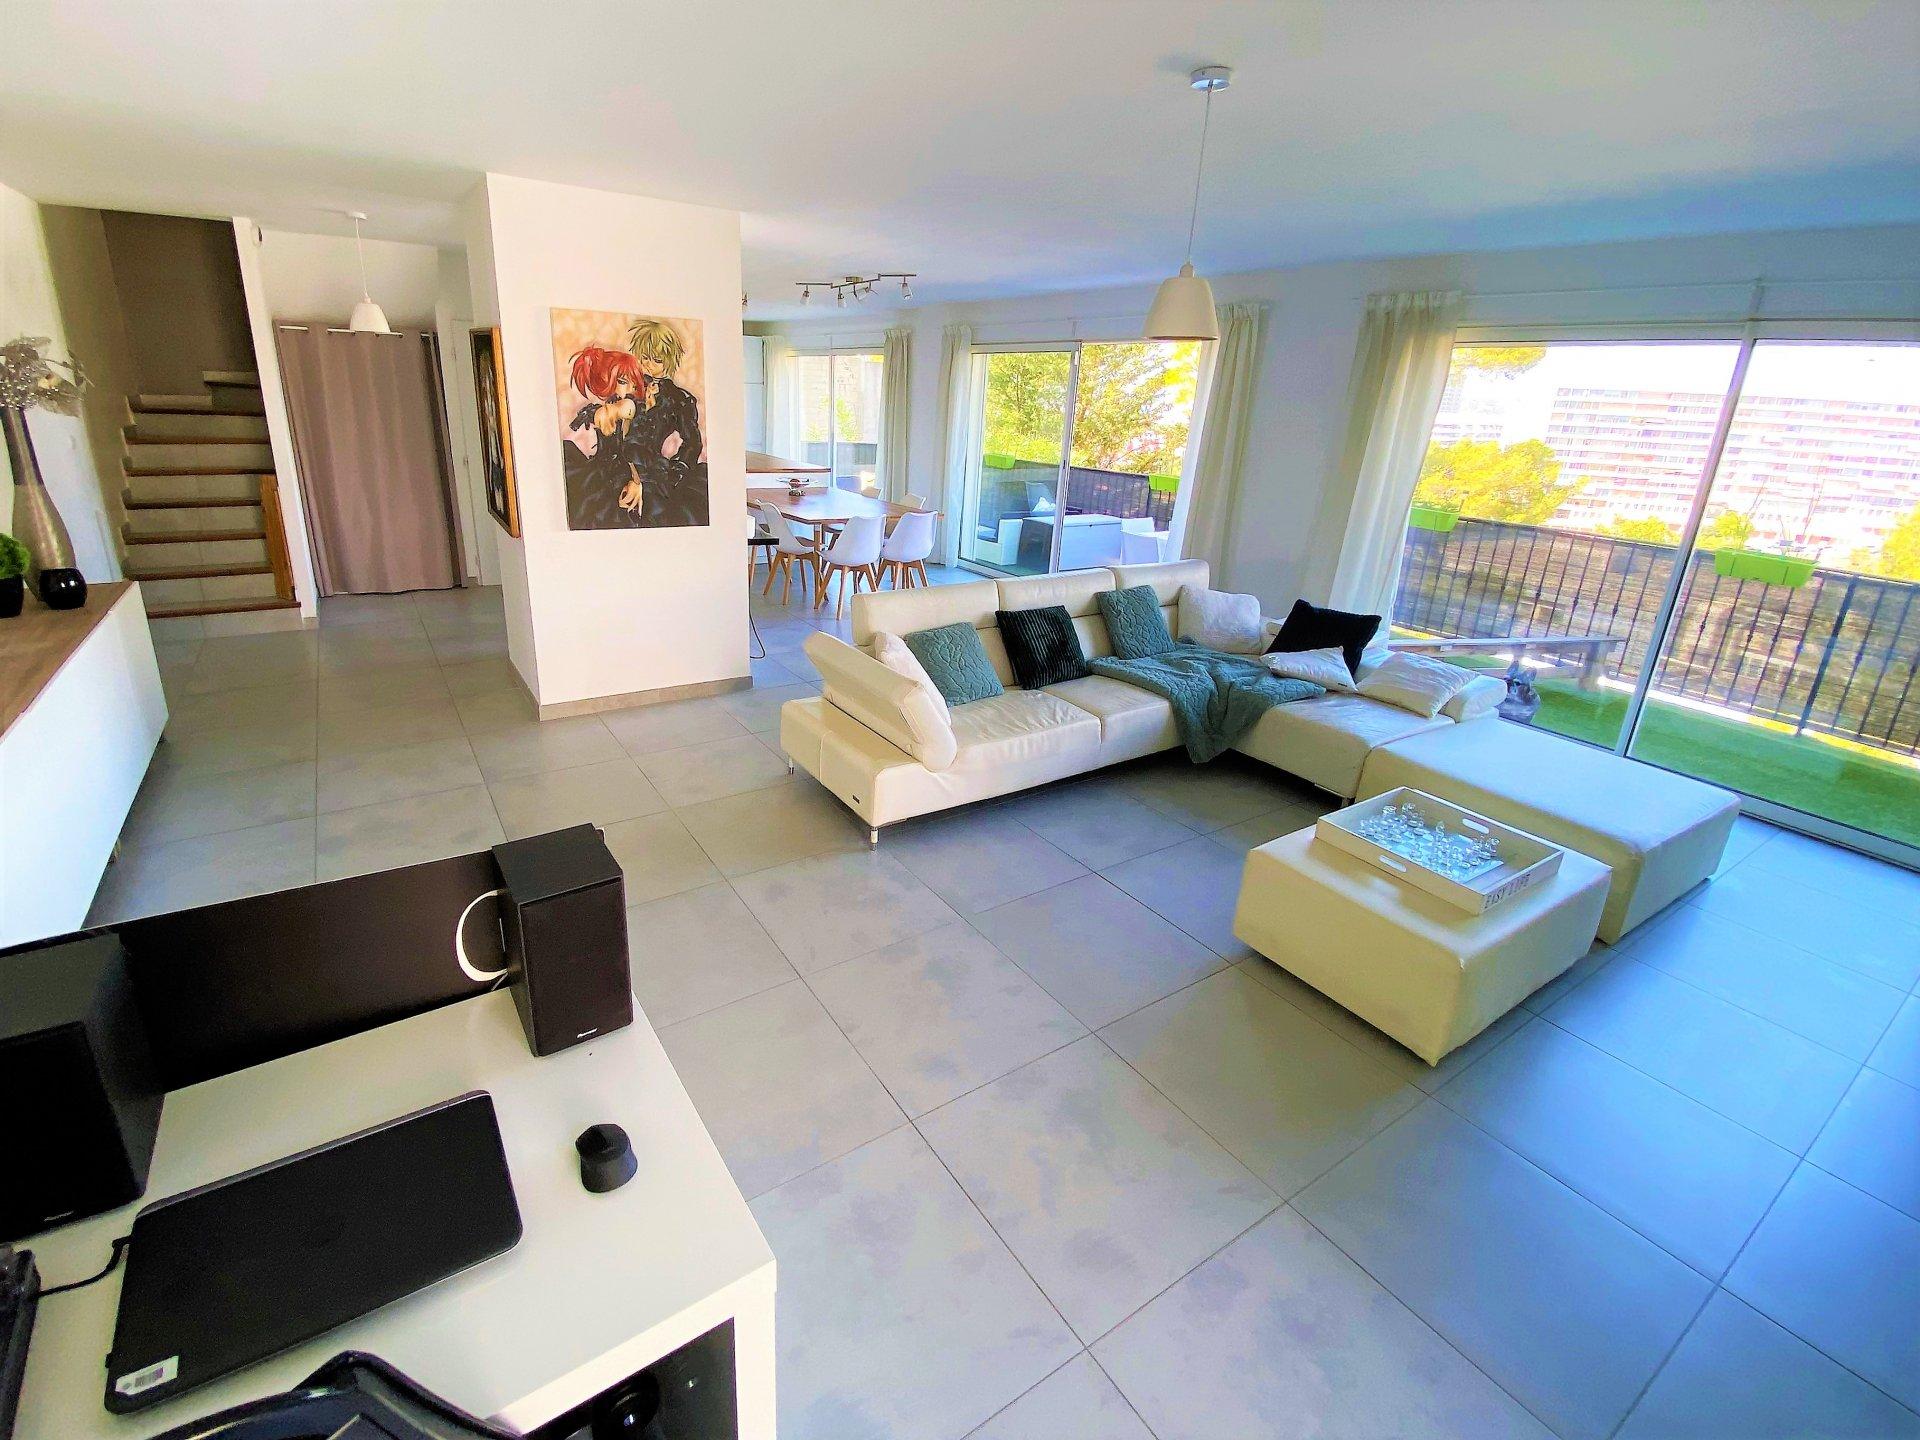 MAISON 135 m2, garage, terrasses